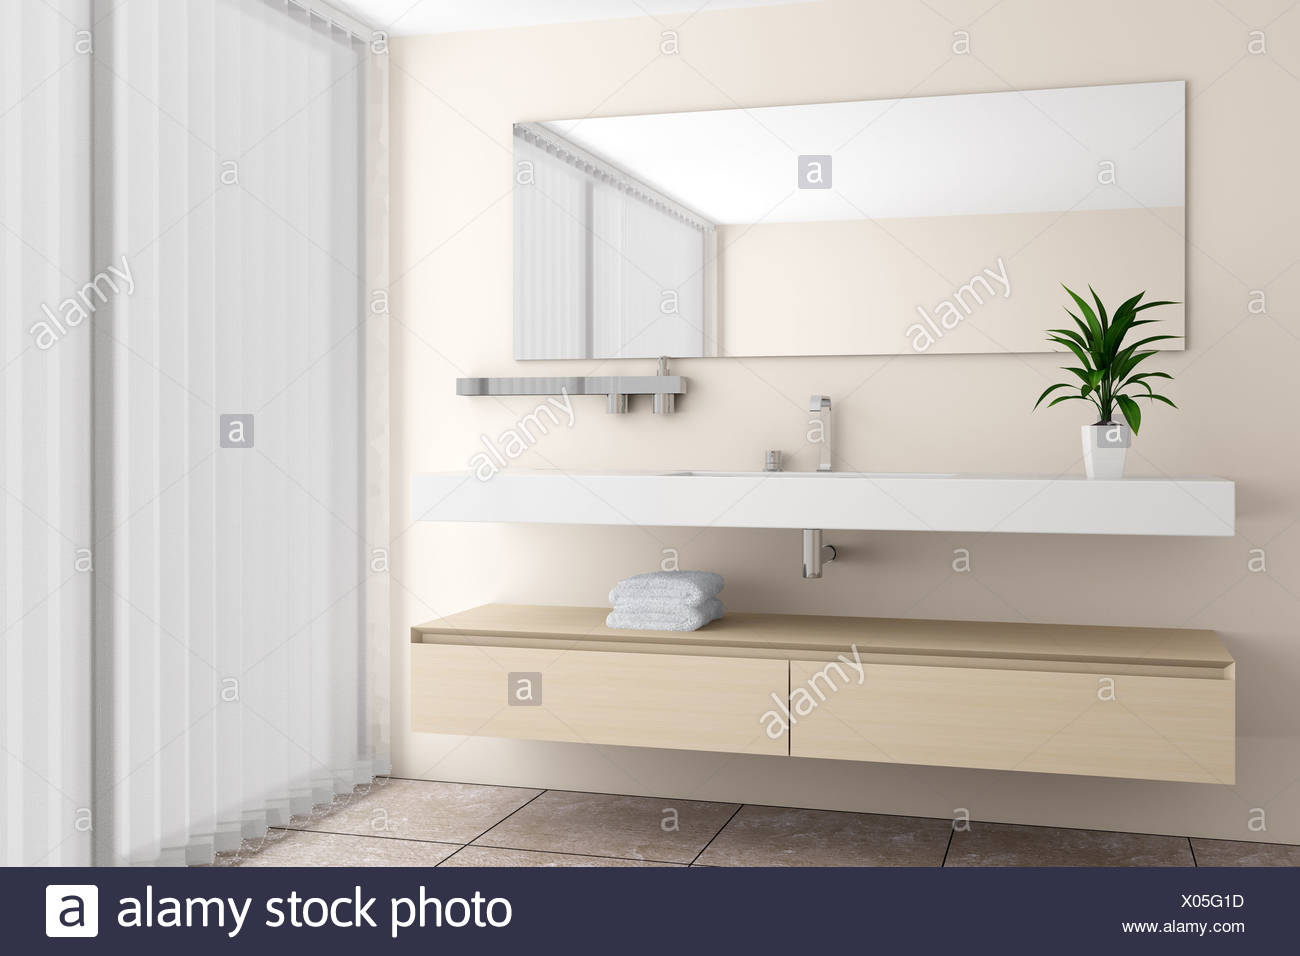 modernes Bad mit Beige Wand Stockfoto, Bild: 275488233 - Alamy